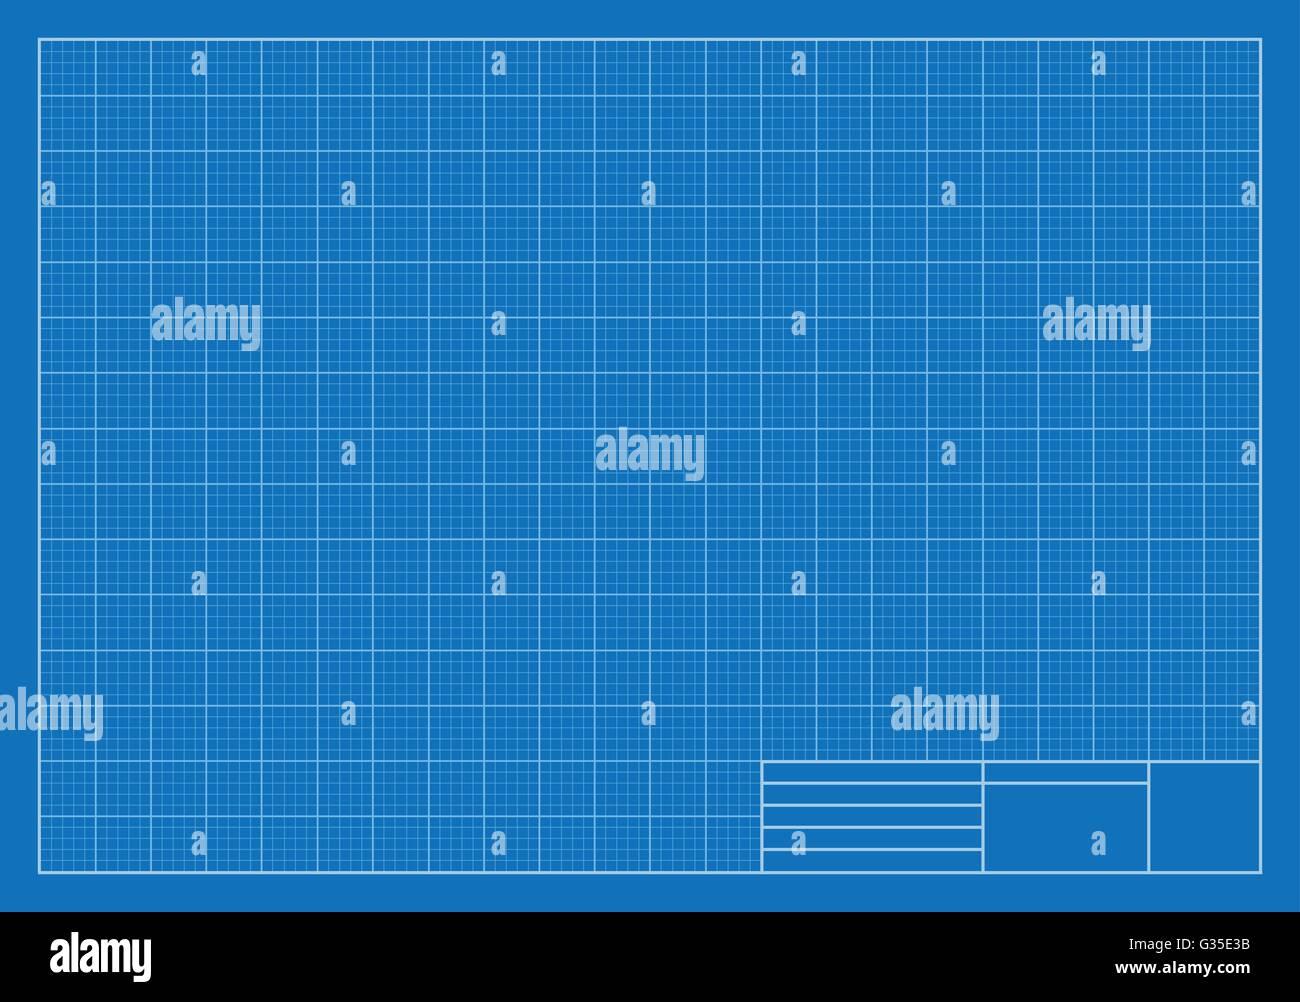 drafting blueprint grid architecture stock vector art